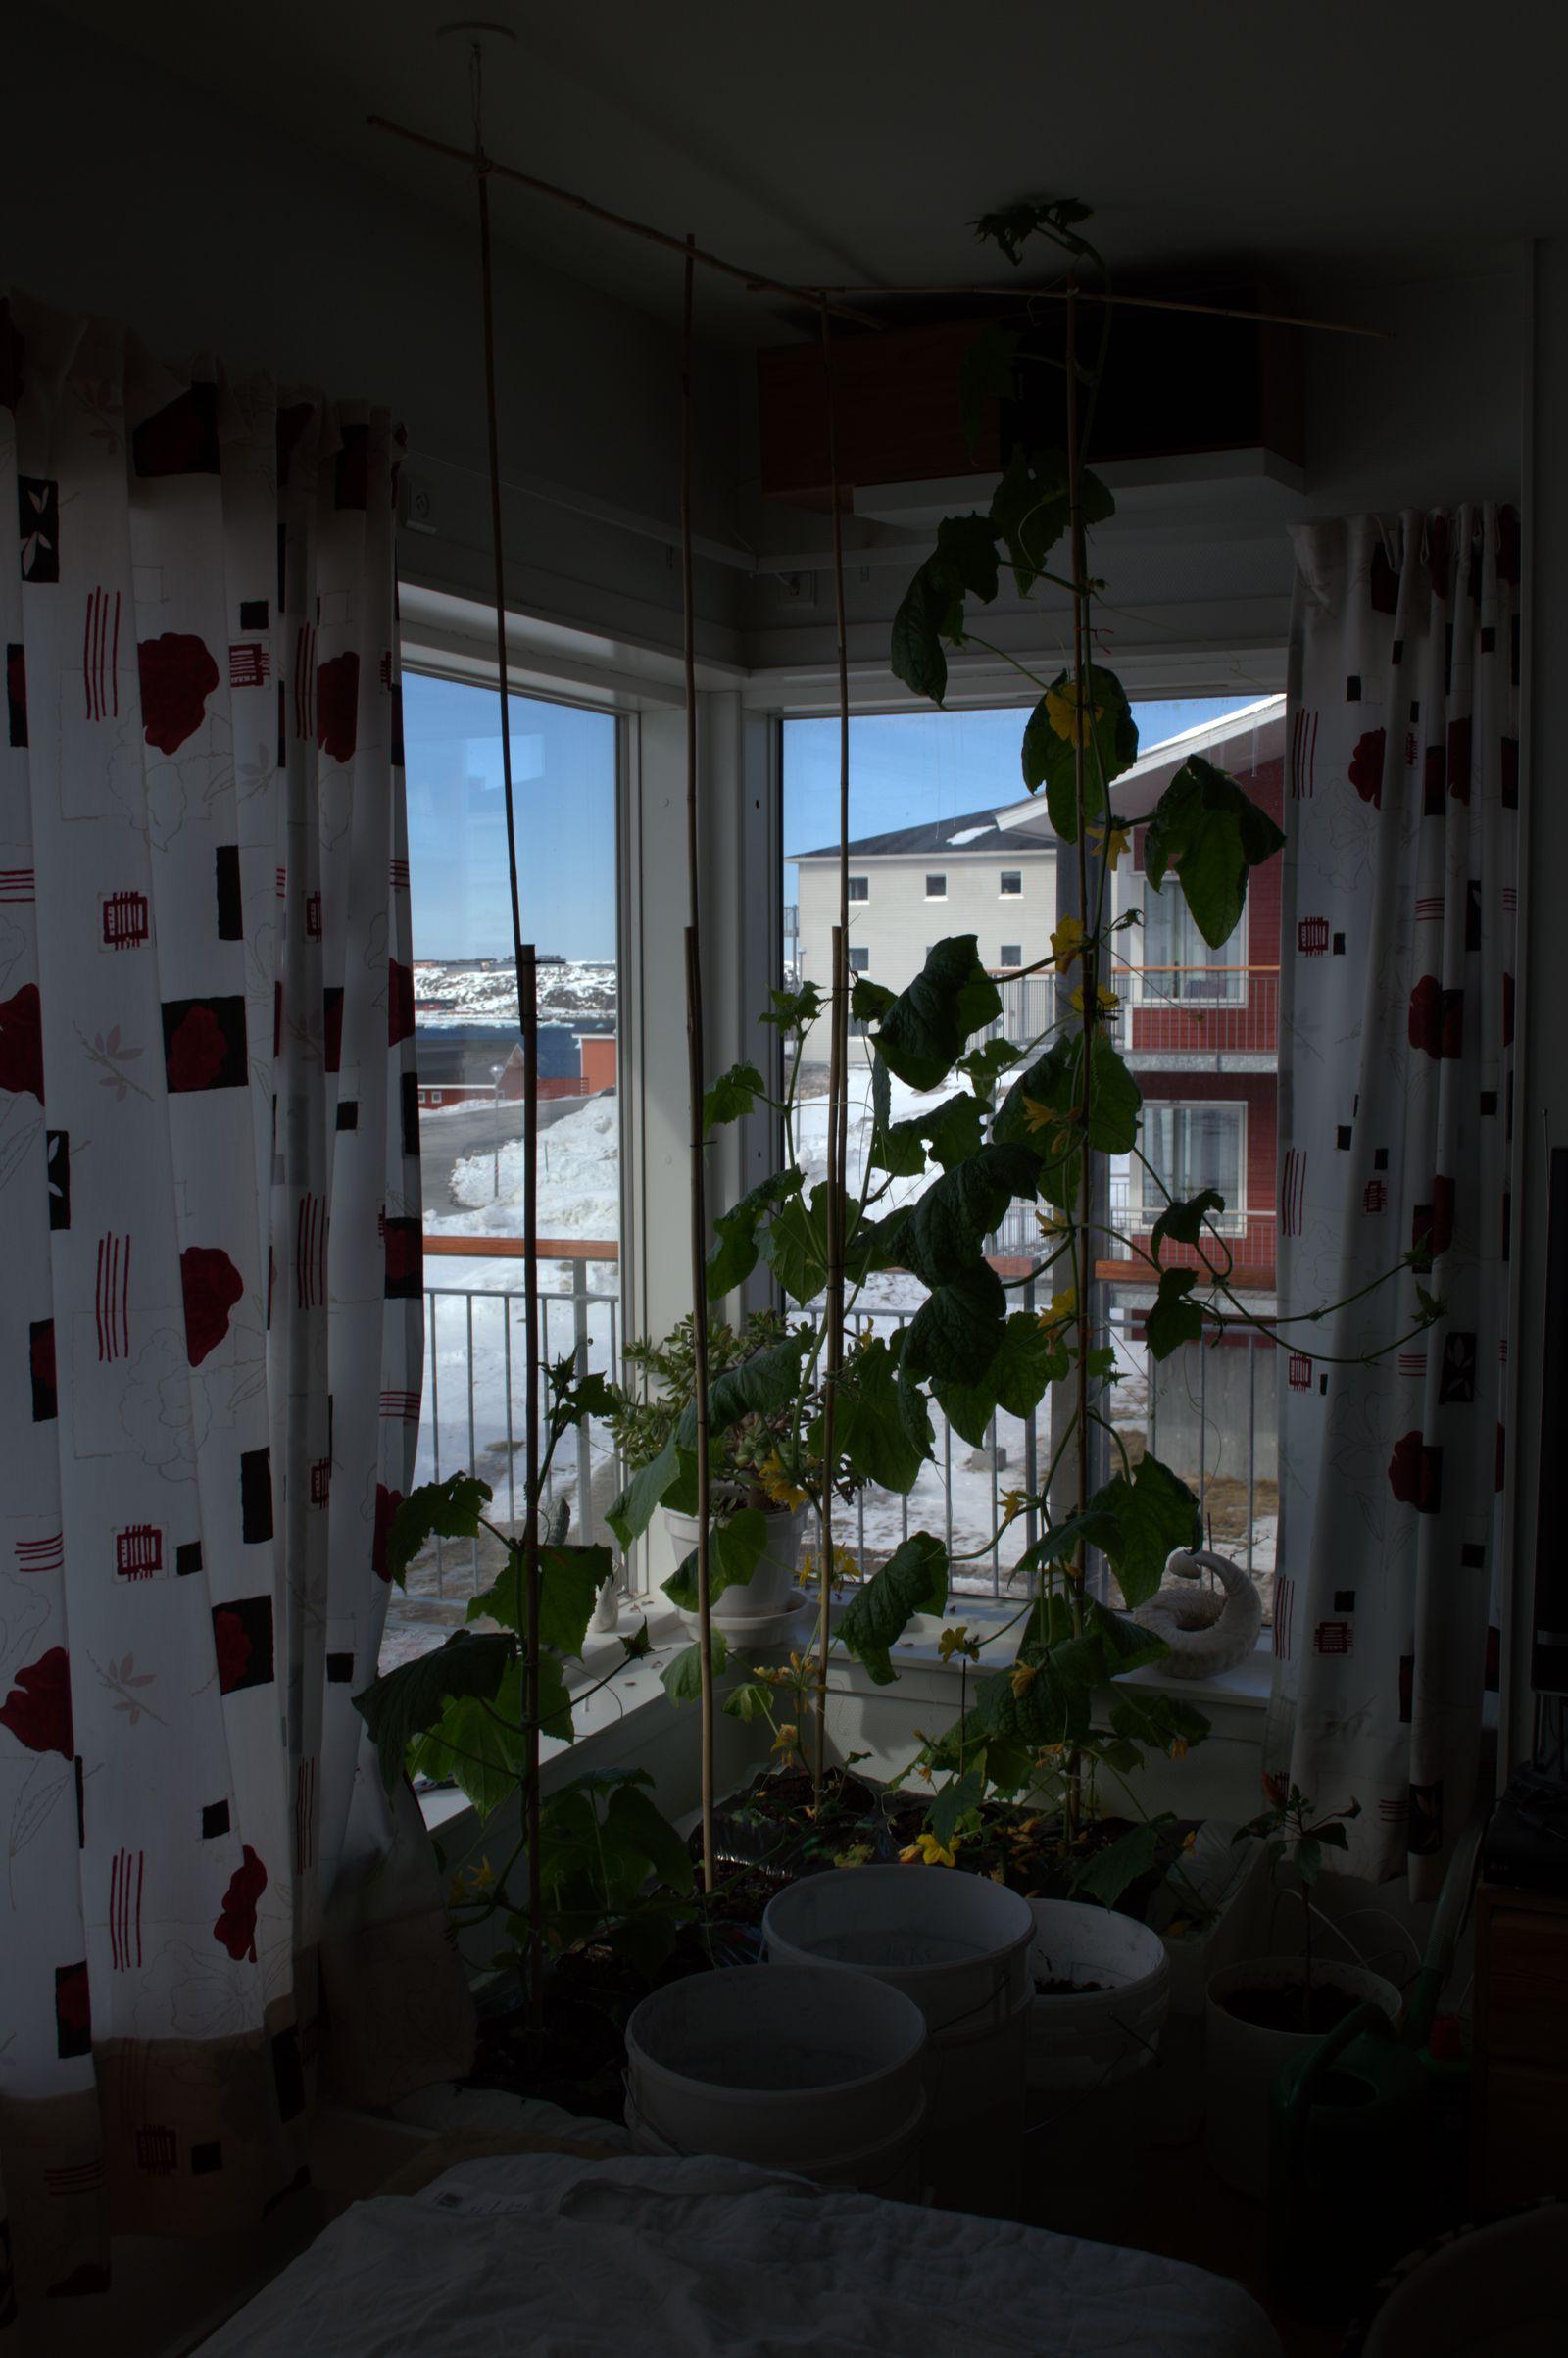 2014-04-30-1207_-_Agurkeplante_Kartofelspande_Planter